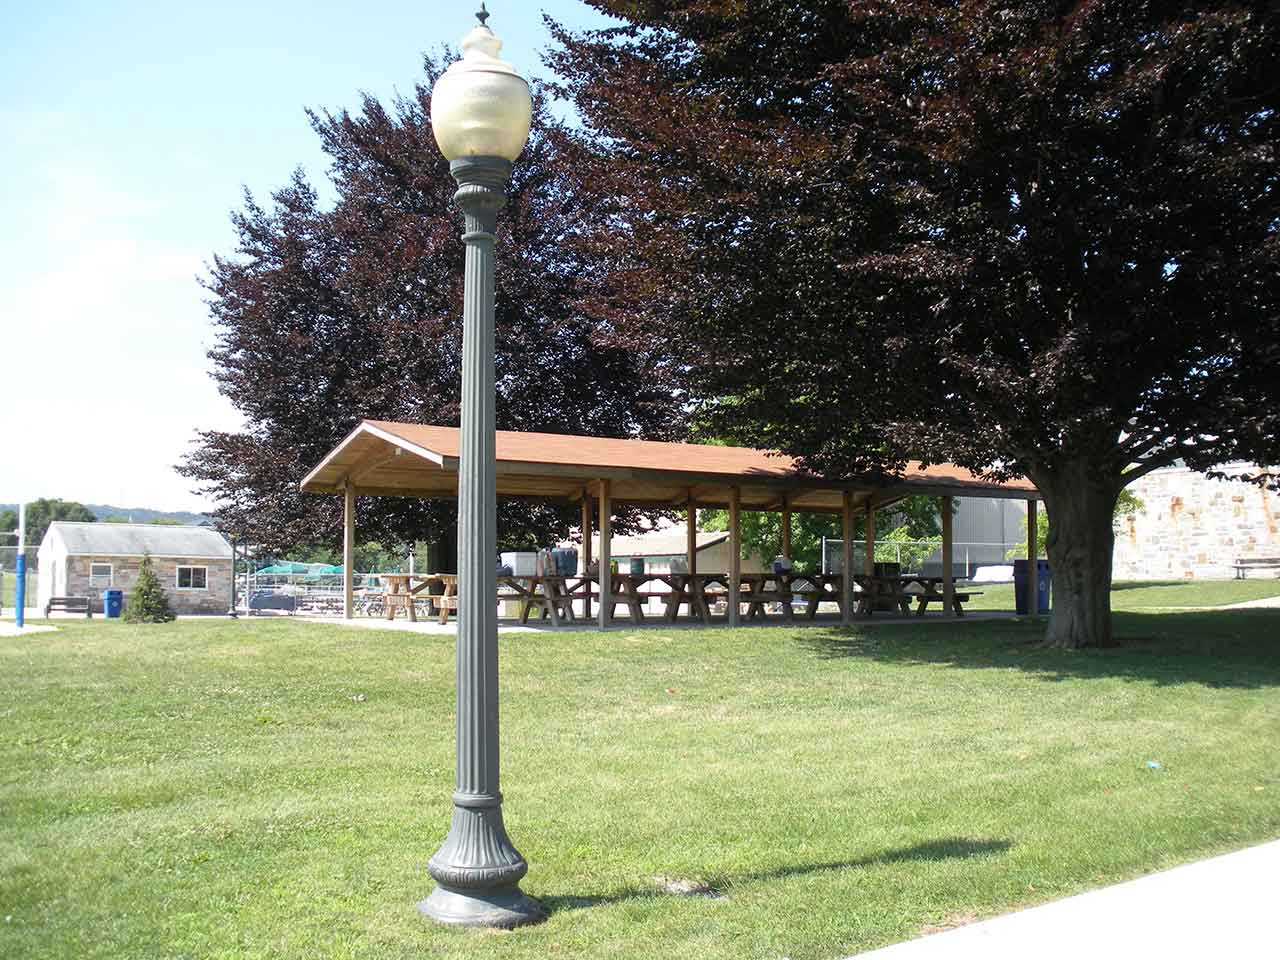 Hershey Recreation Center Birthday Party Pavilion